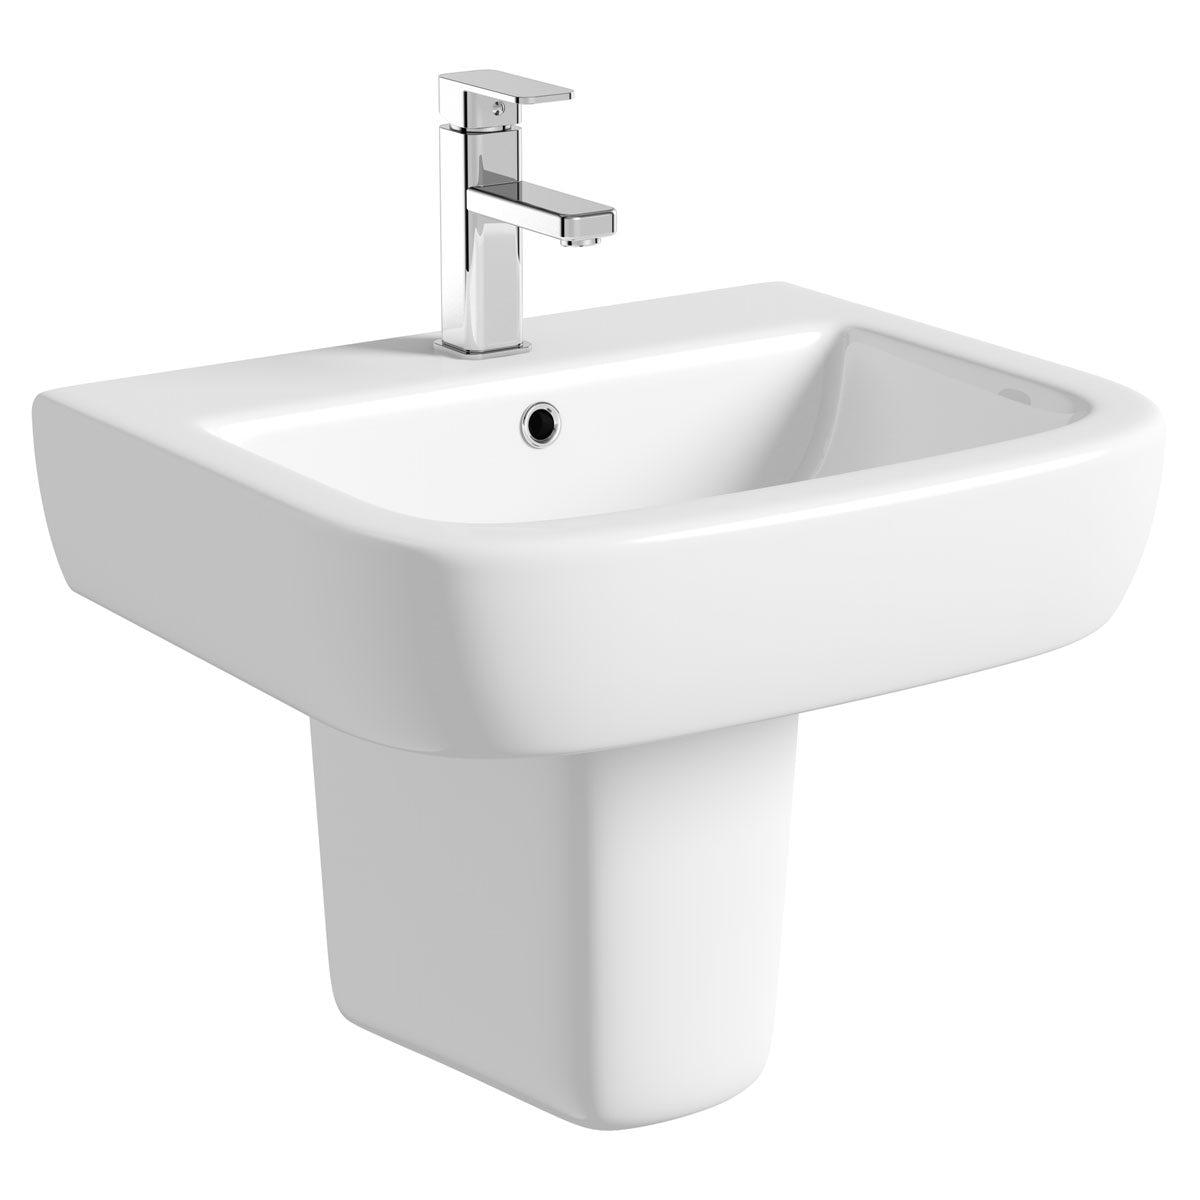 Mode Ellis semi pedestal basin 560mm with waste